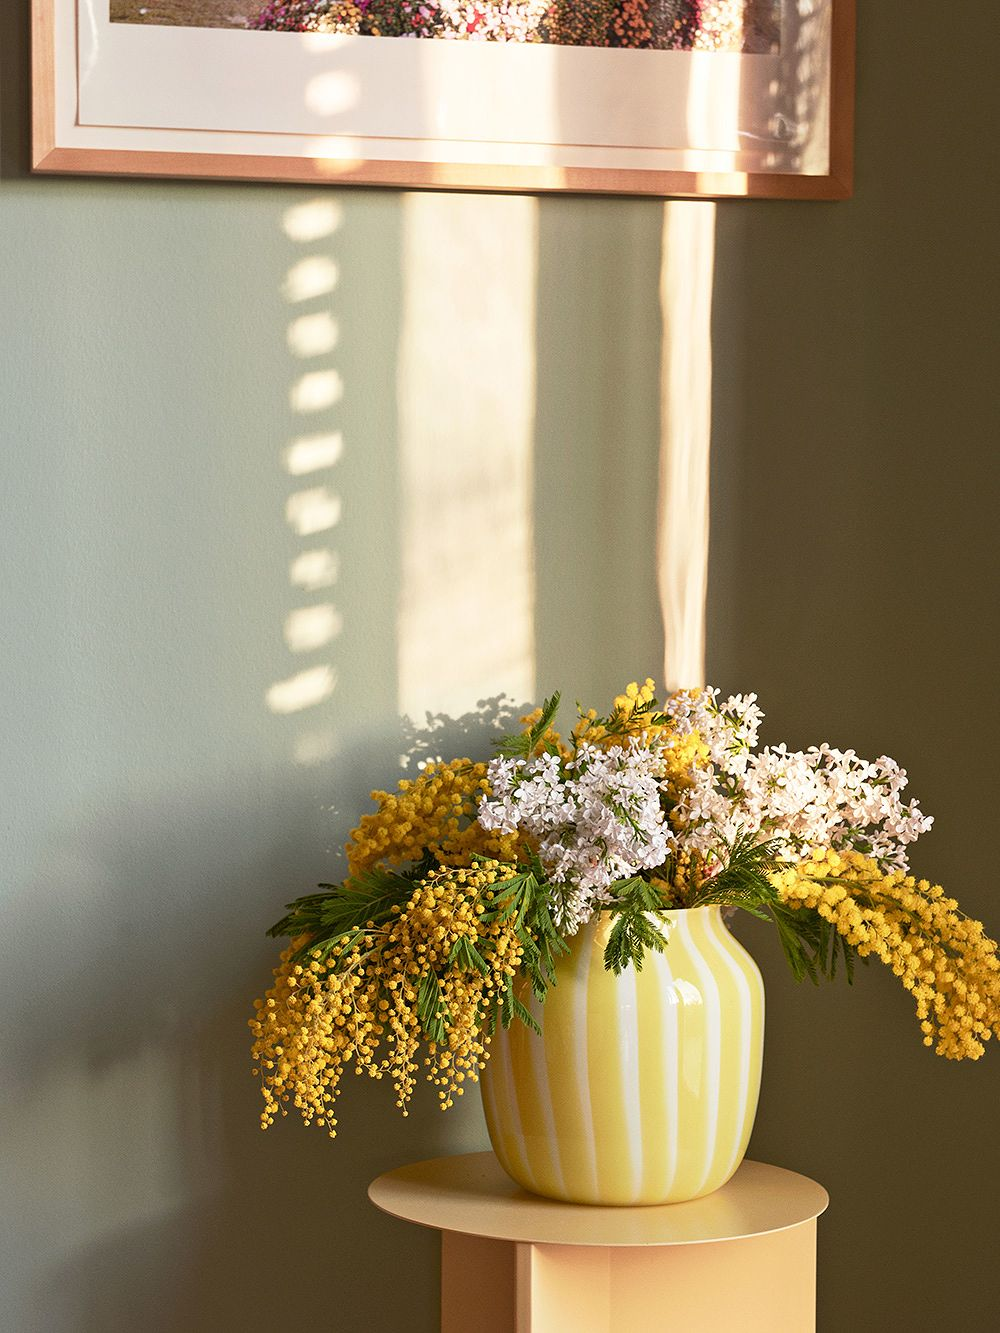 Hay's wide, vibrant yellowJuice vase